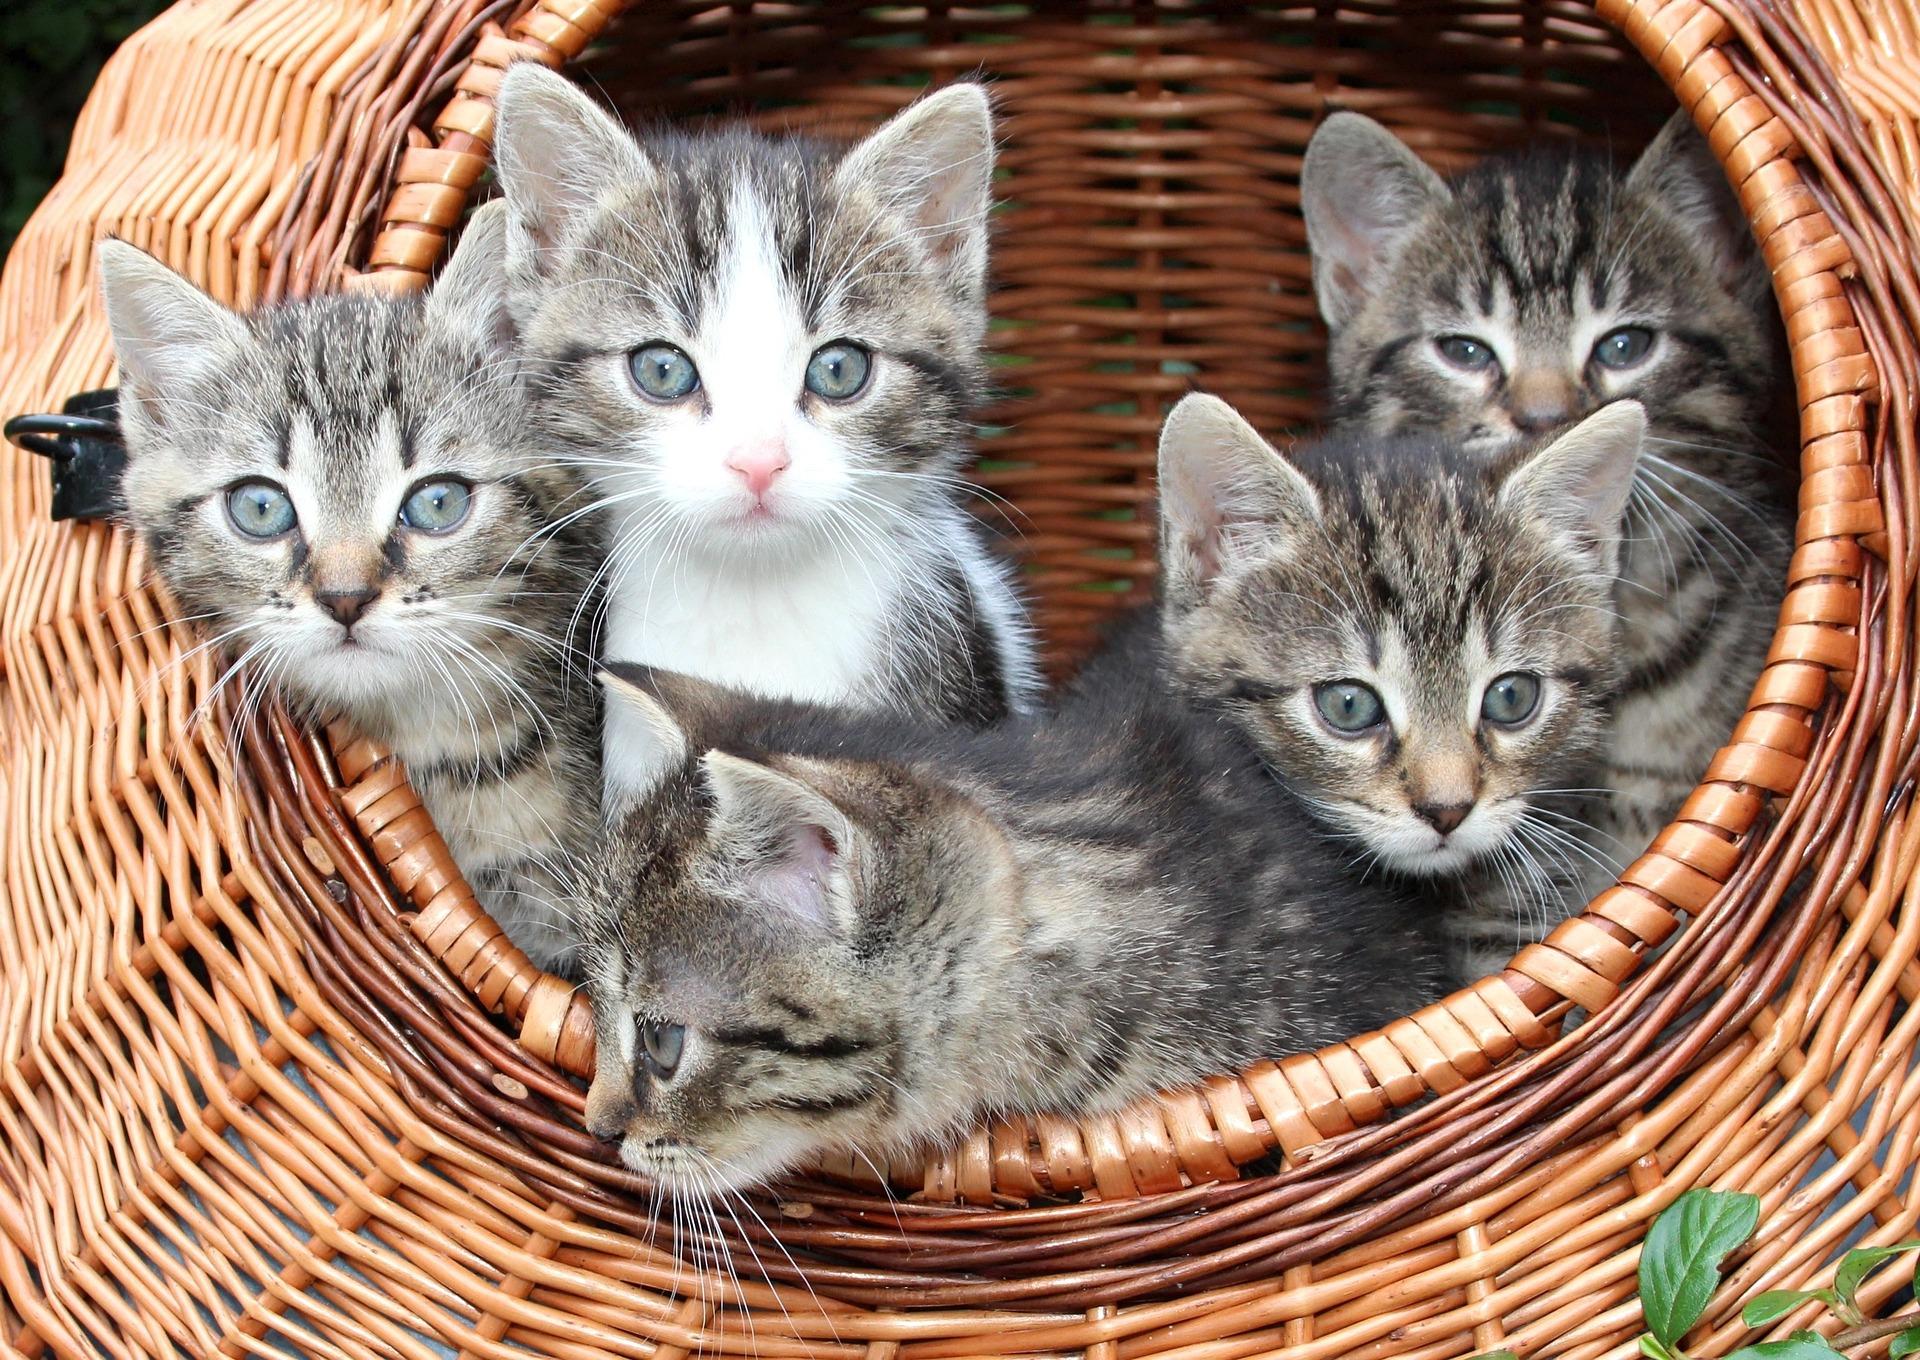 Word story - like herding cats